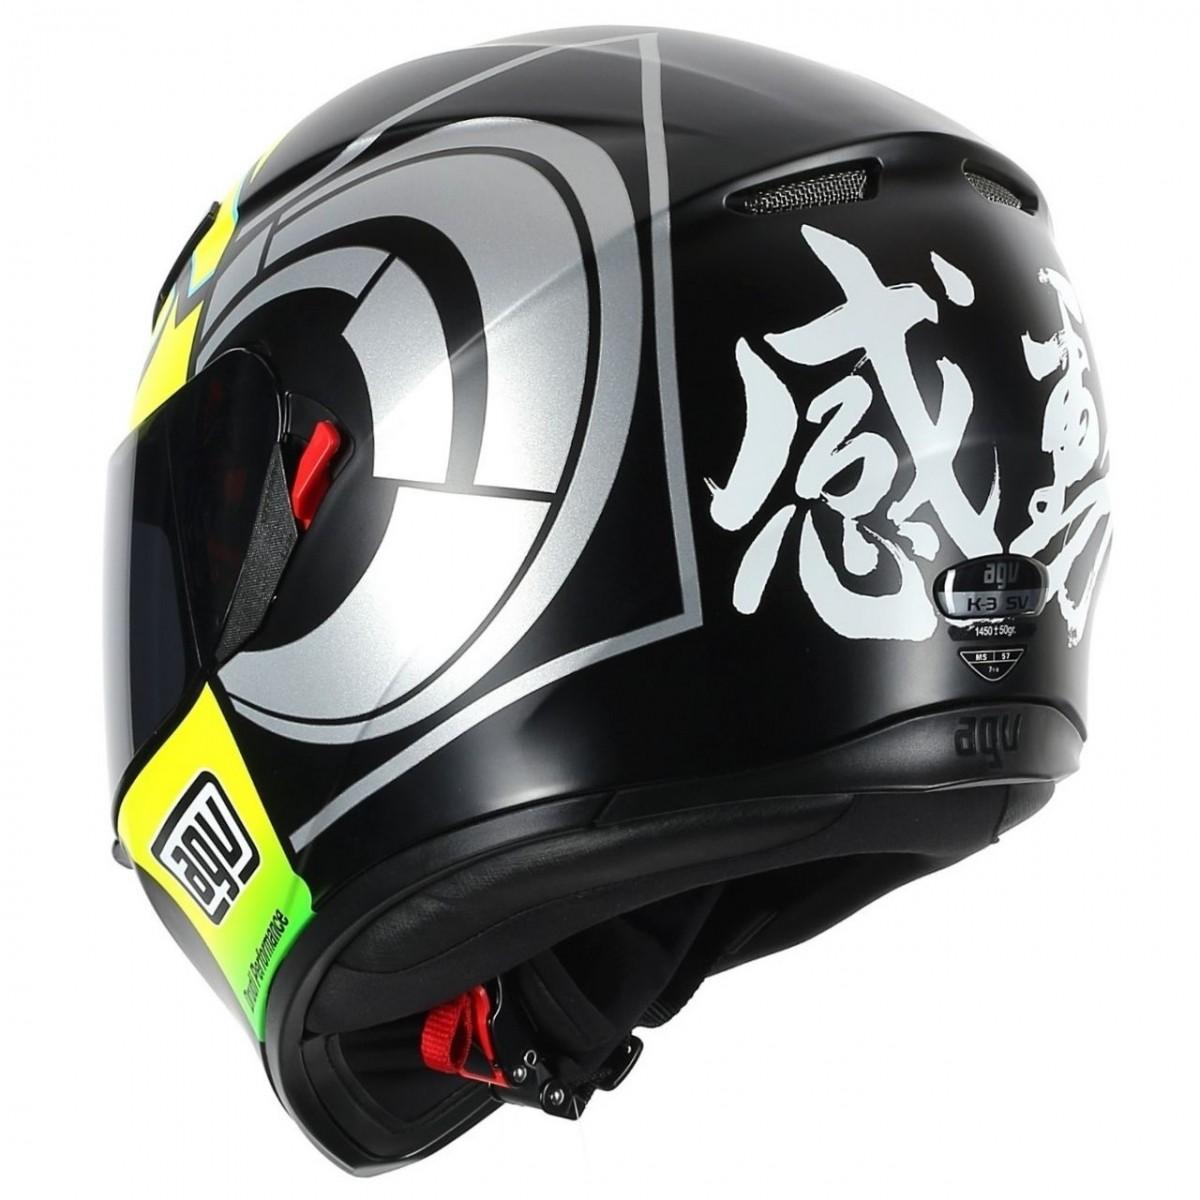 Capacete AGV K-3 SV Winter Test 12 Valentino Rossi C/ Viseira Interna Solar  - Planet Bike Shop Moto Acessórios